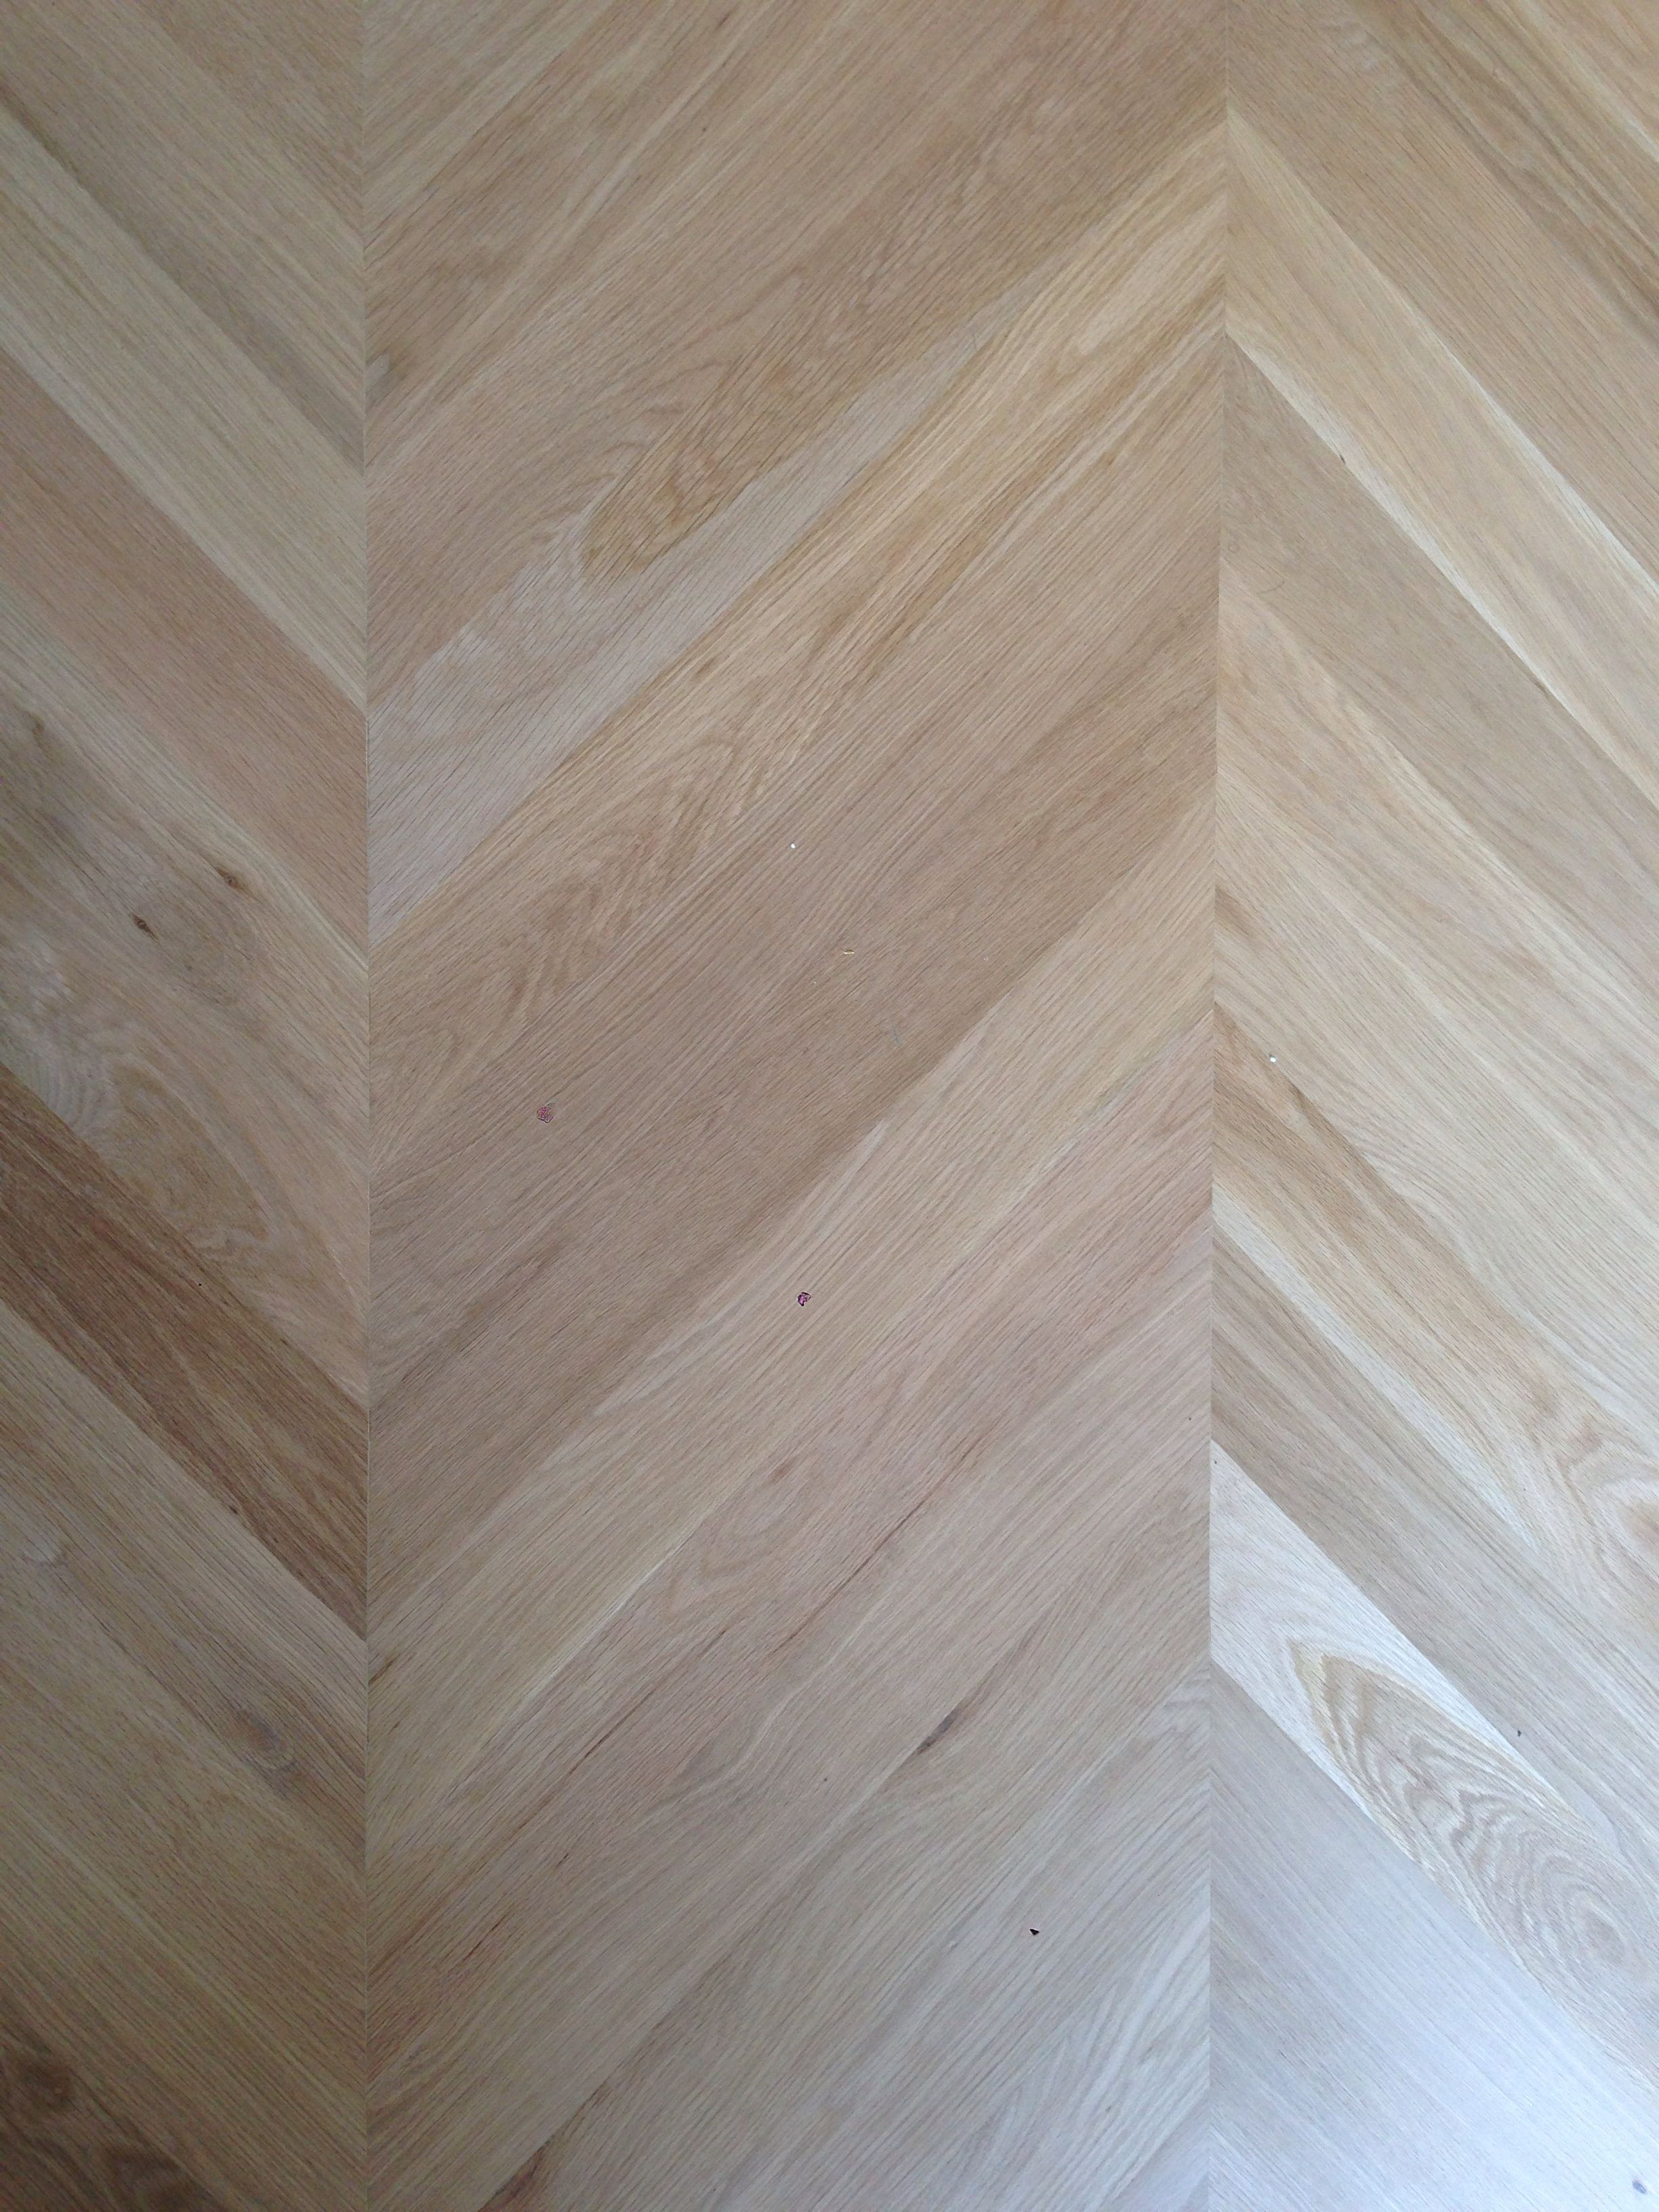 Chevron ash wood floor paint materials pinterest Ash wood flooring